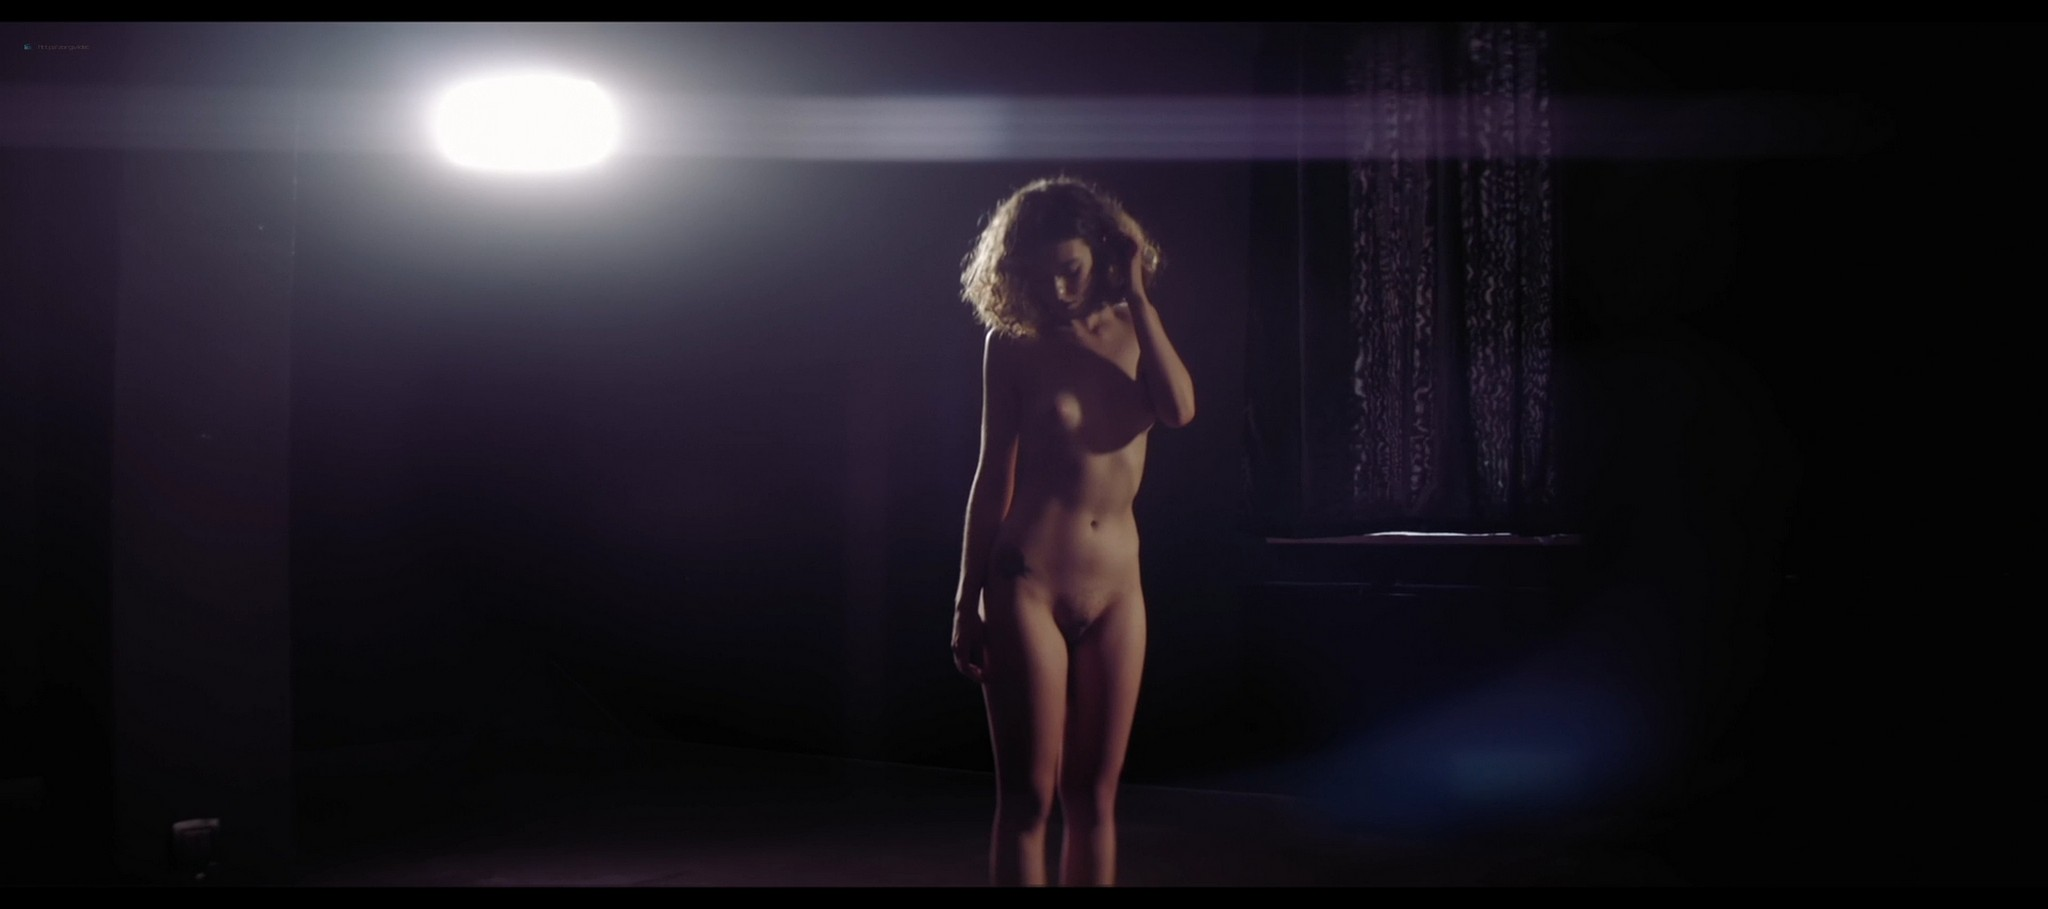 Cristina Chiriac nude full frontal Sofia Rania Dharma Mangia Woods full frontal too Tommaso 2019 HD 1080p Bluray 012